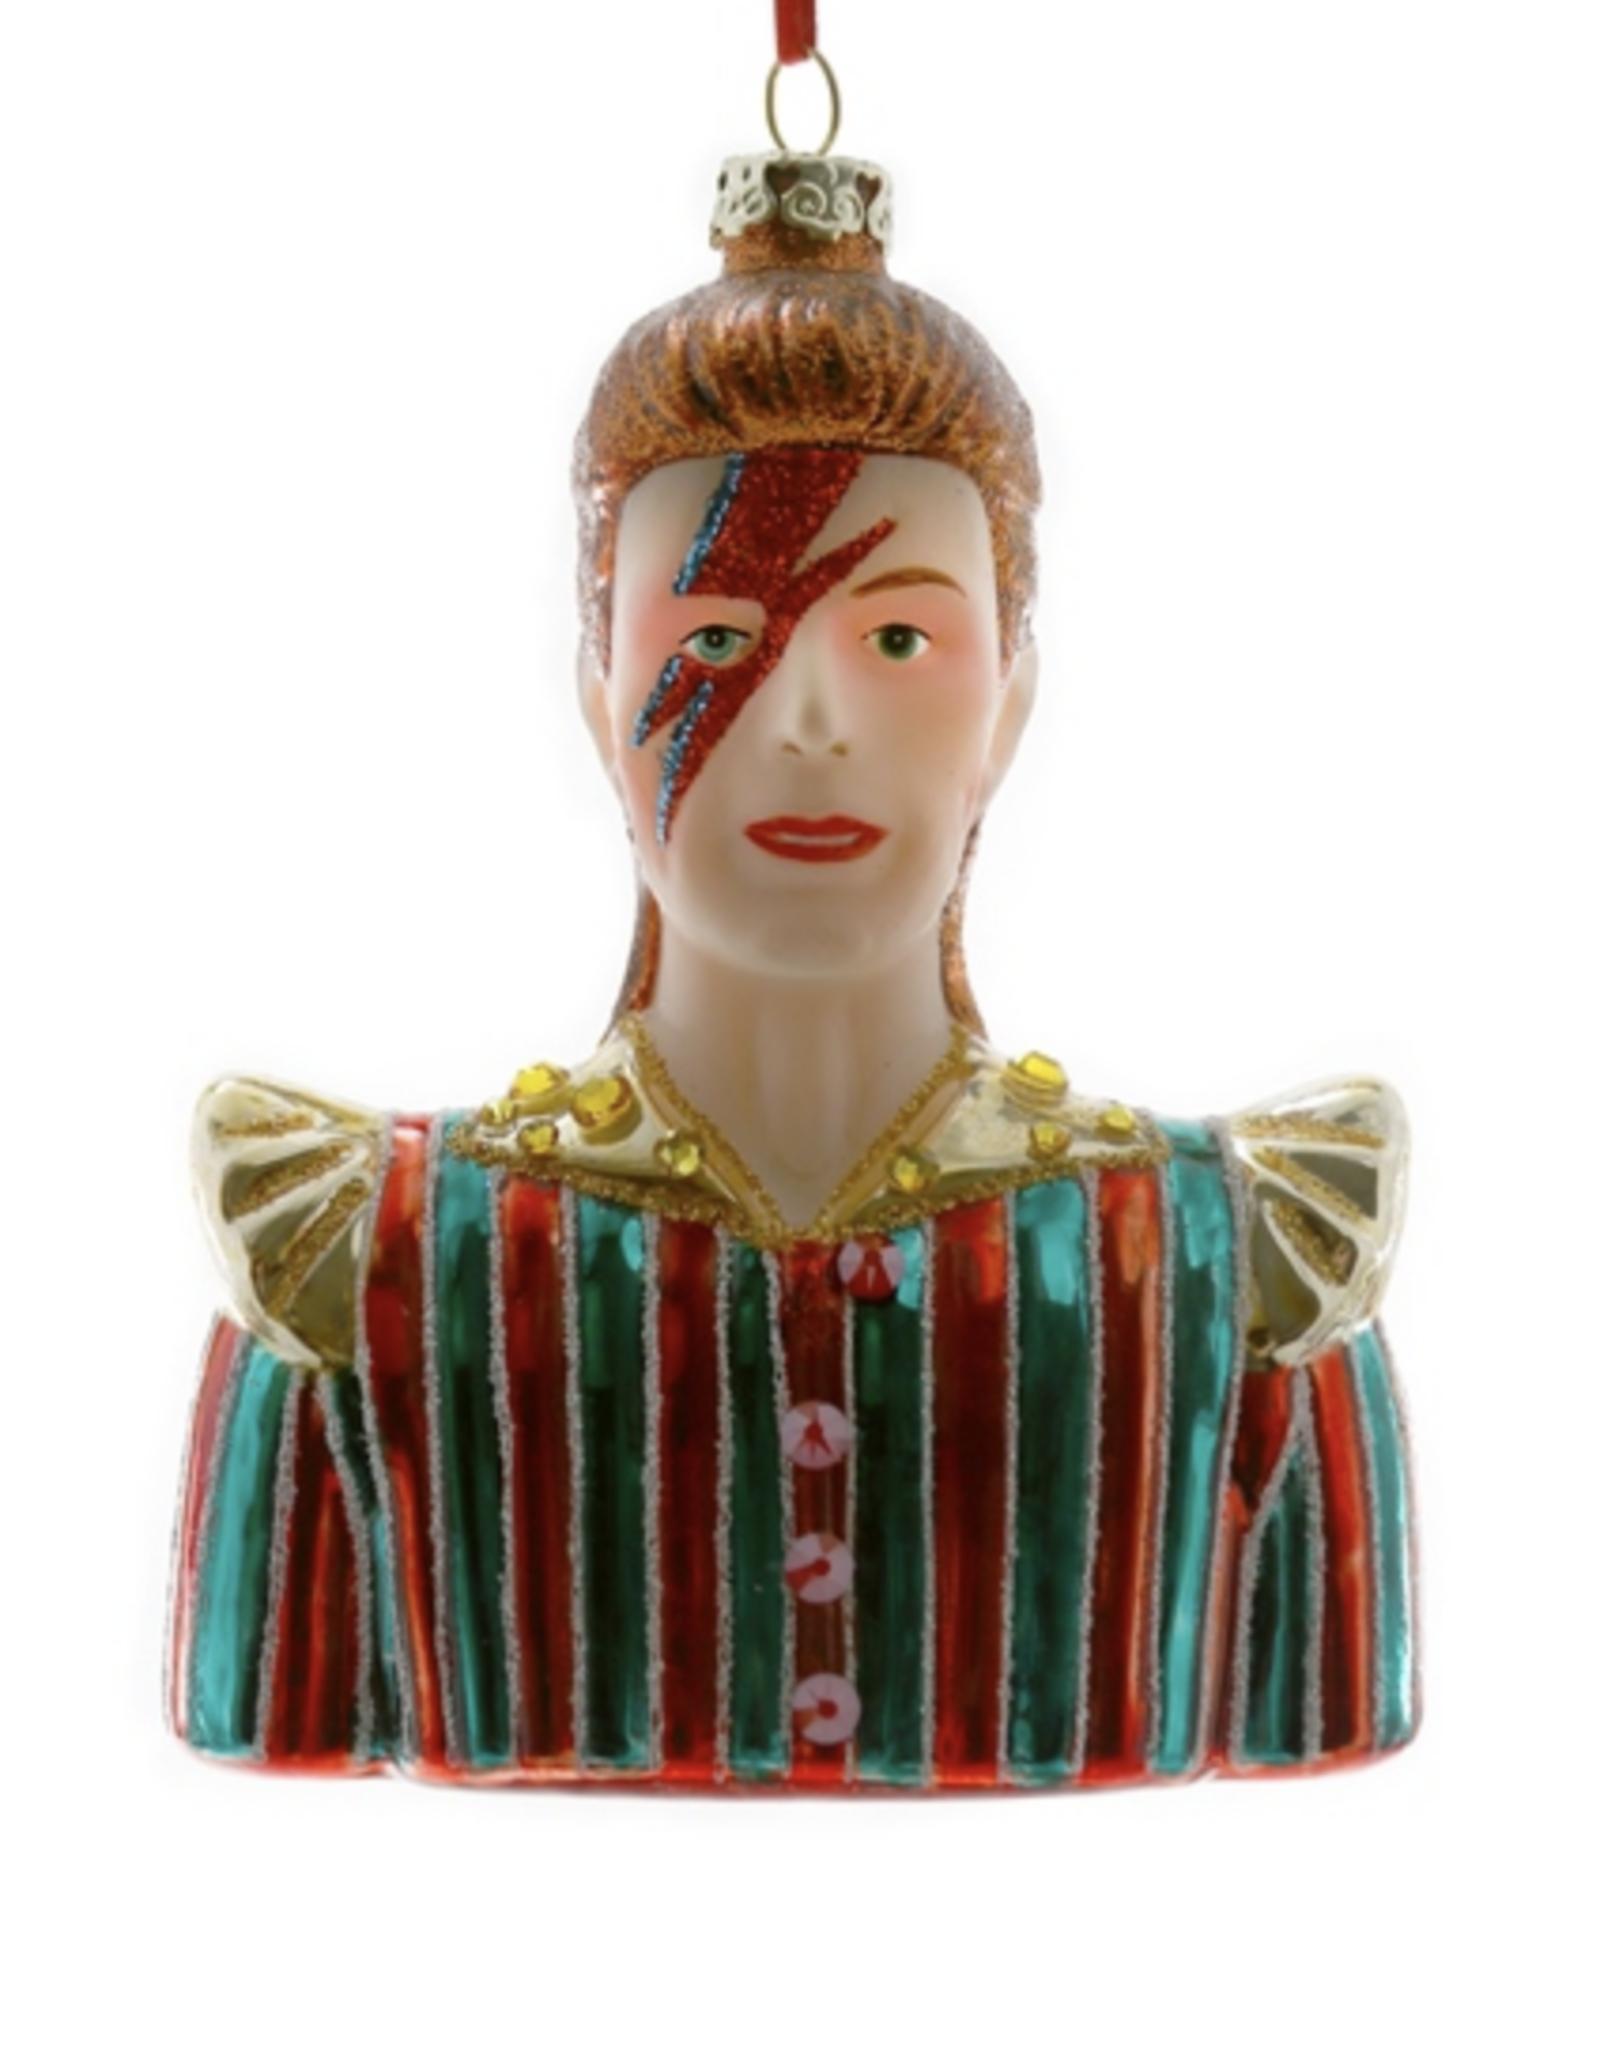 David Bowie Glass Ornament